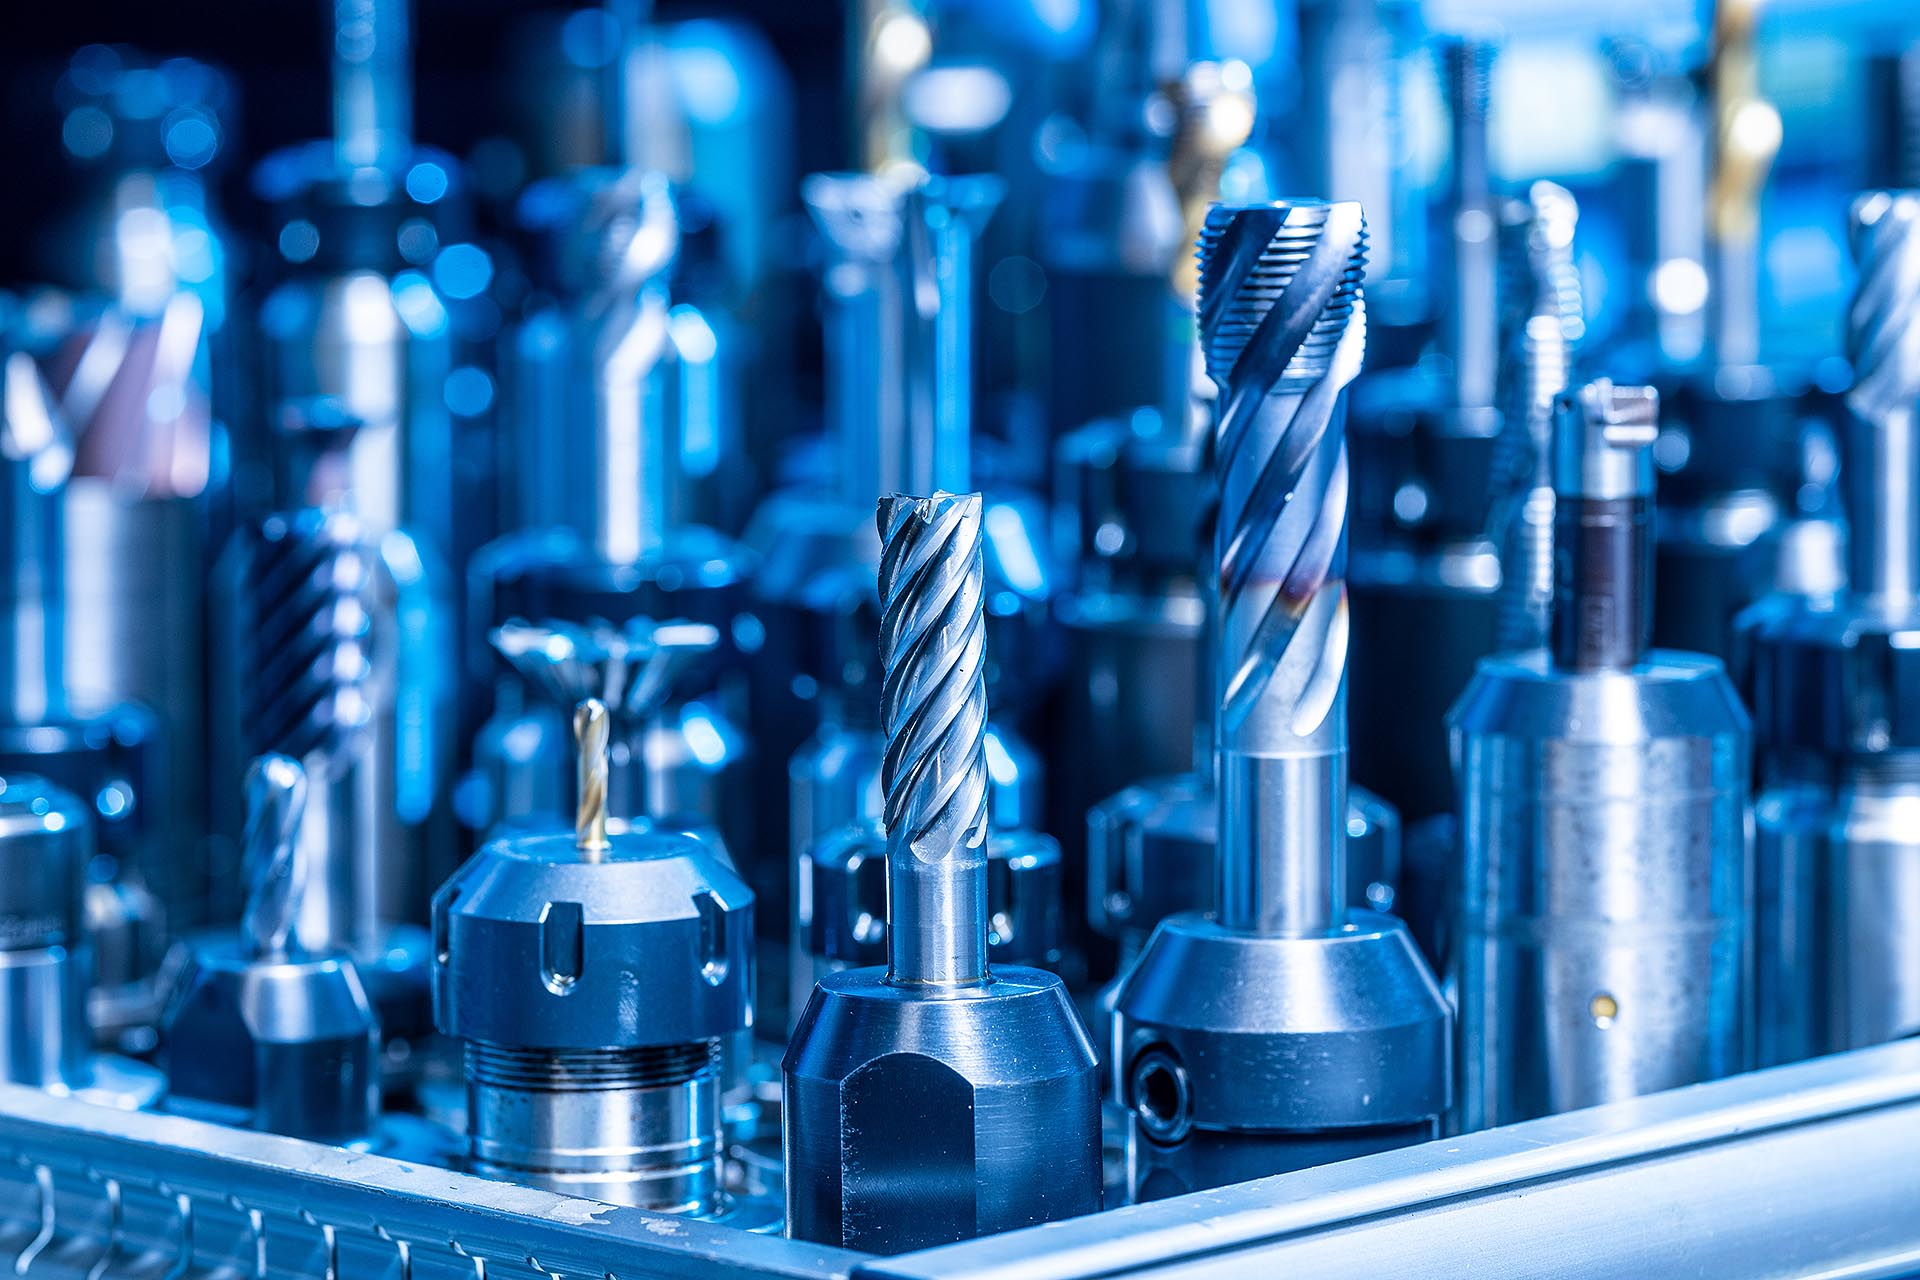 Faszination Metall: Bühlmann Maschinenbau AG